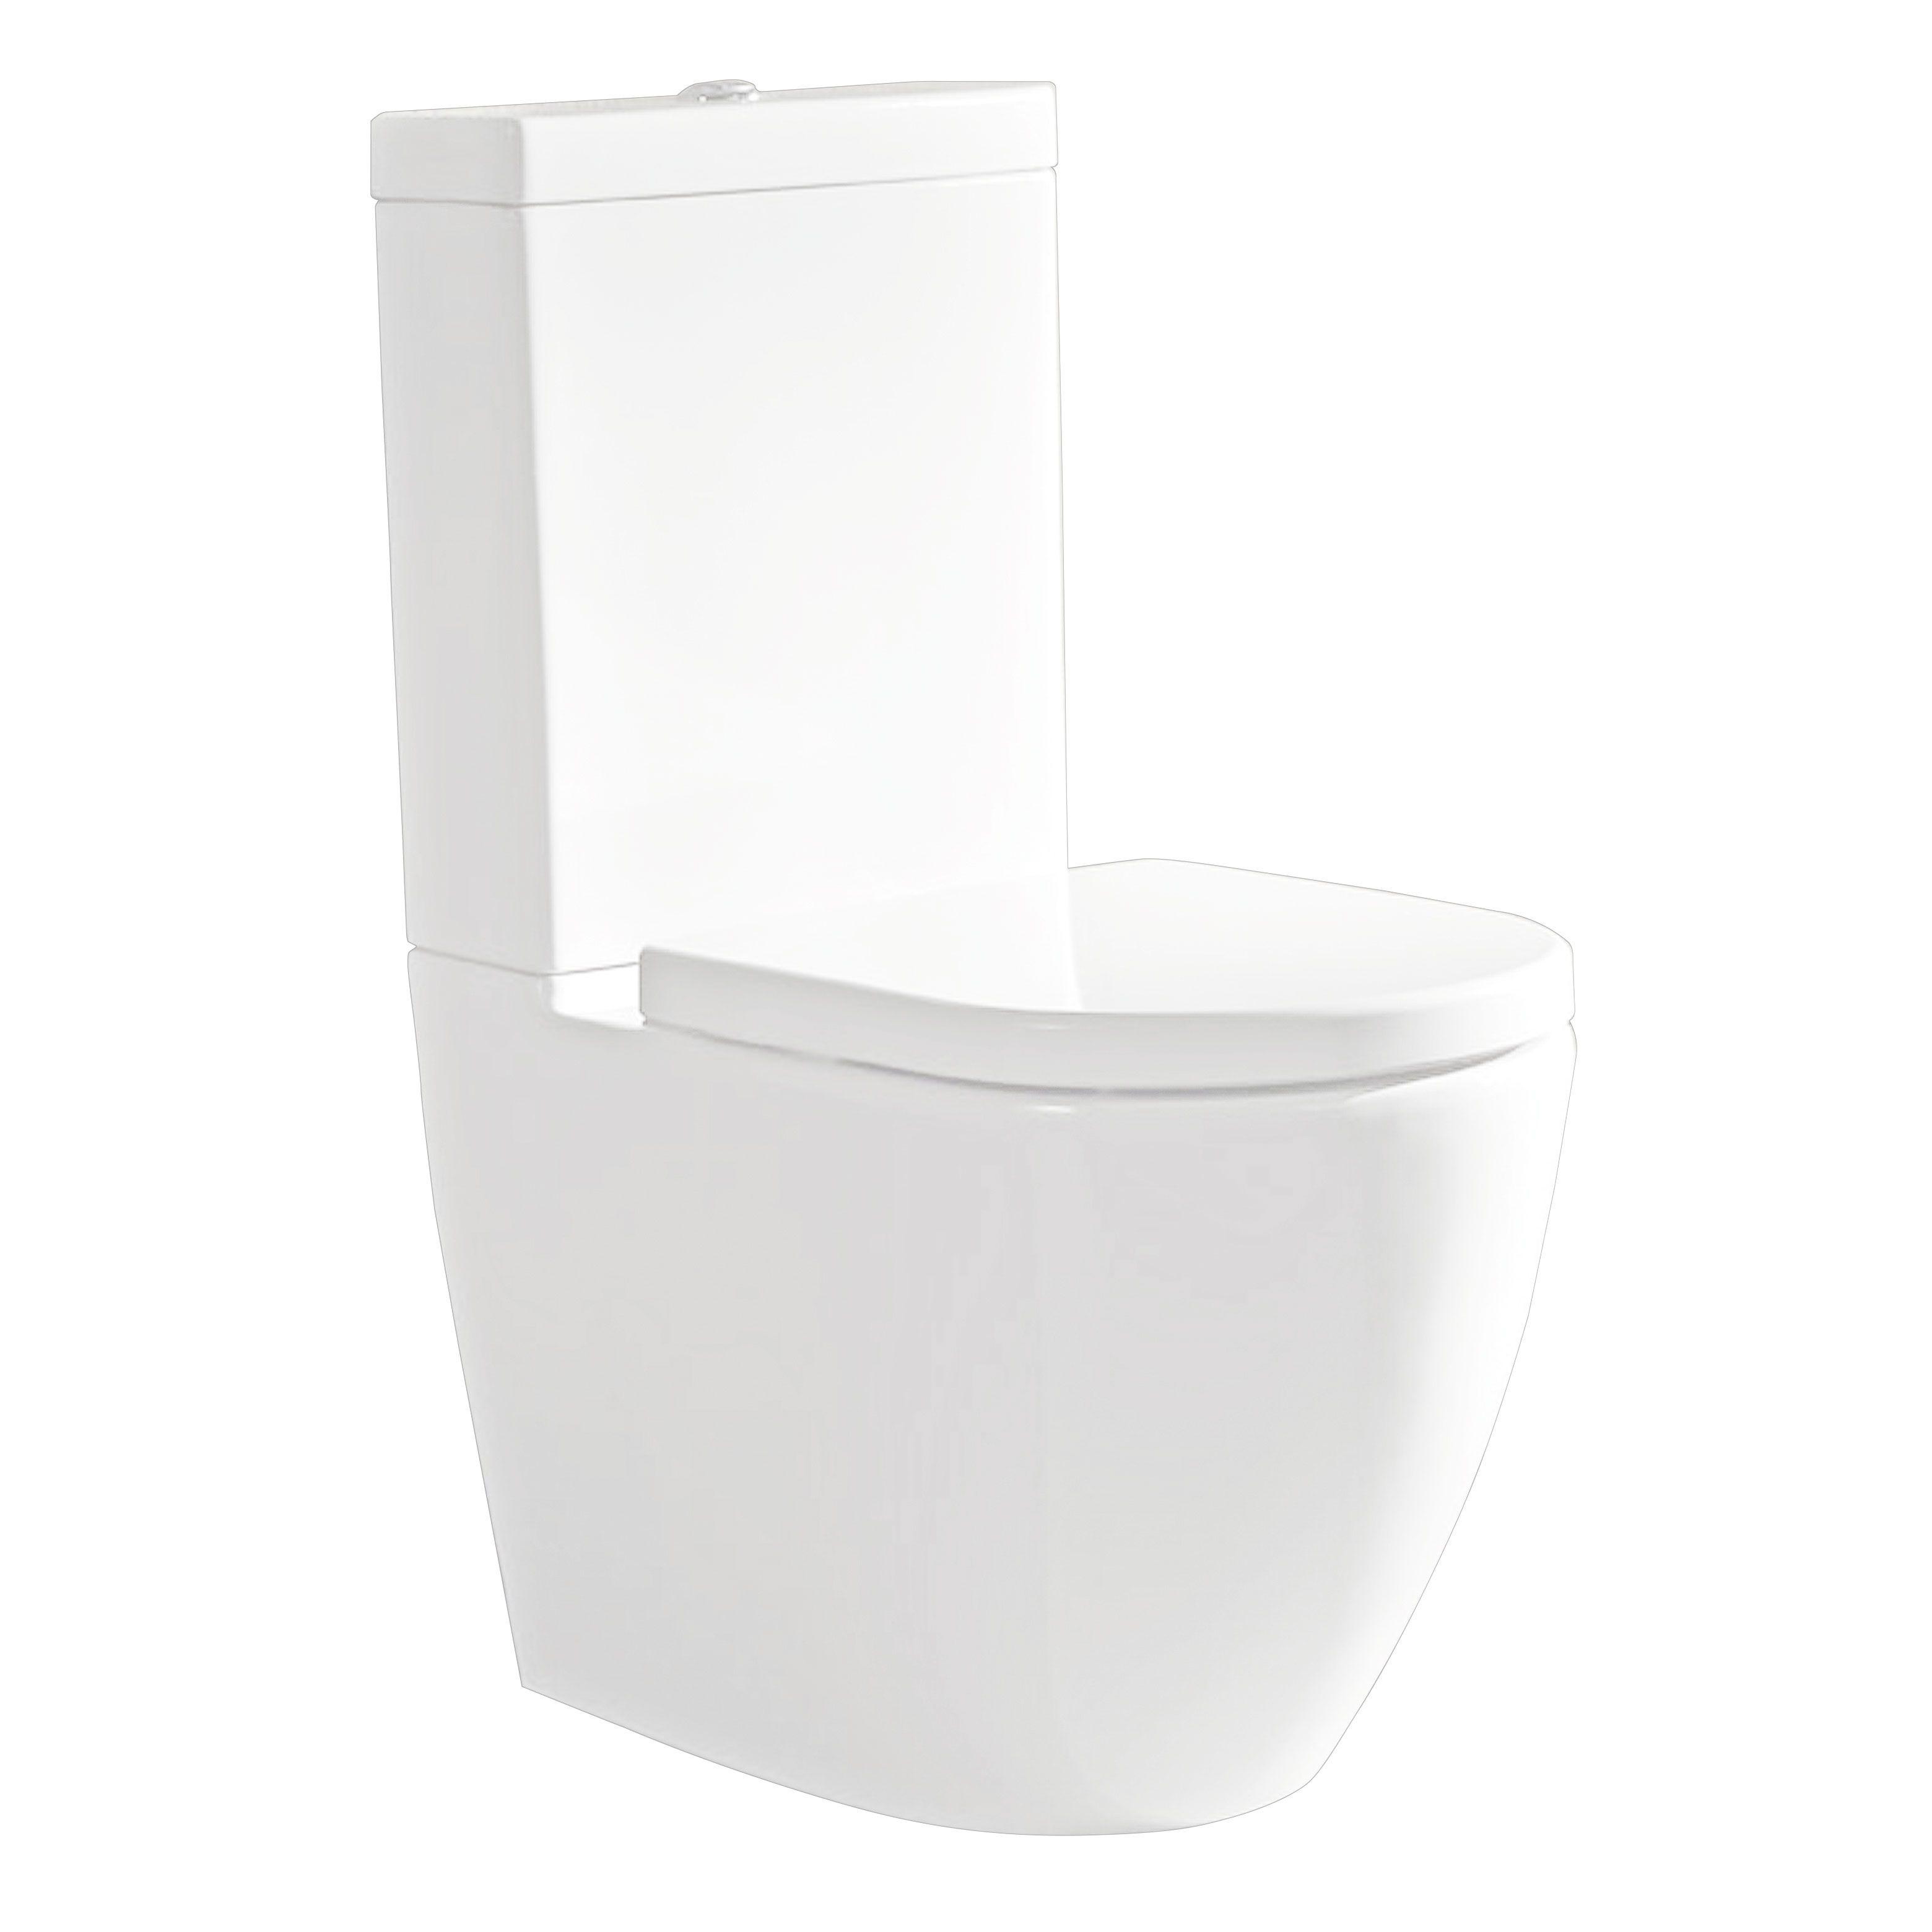 Surprising Parisi Ellisse Back To Wall Toilet Suite Domayne Online Creativecarmelina Interior Chair Design Creativecarmelinacom